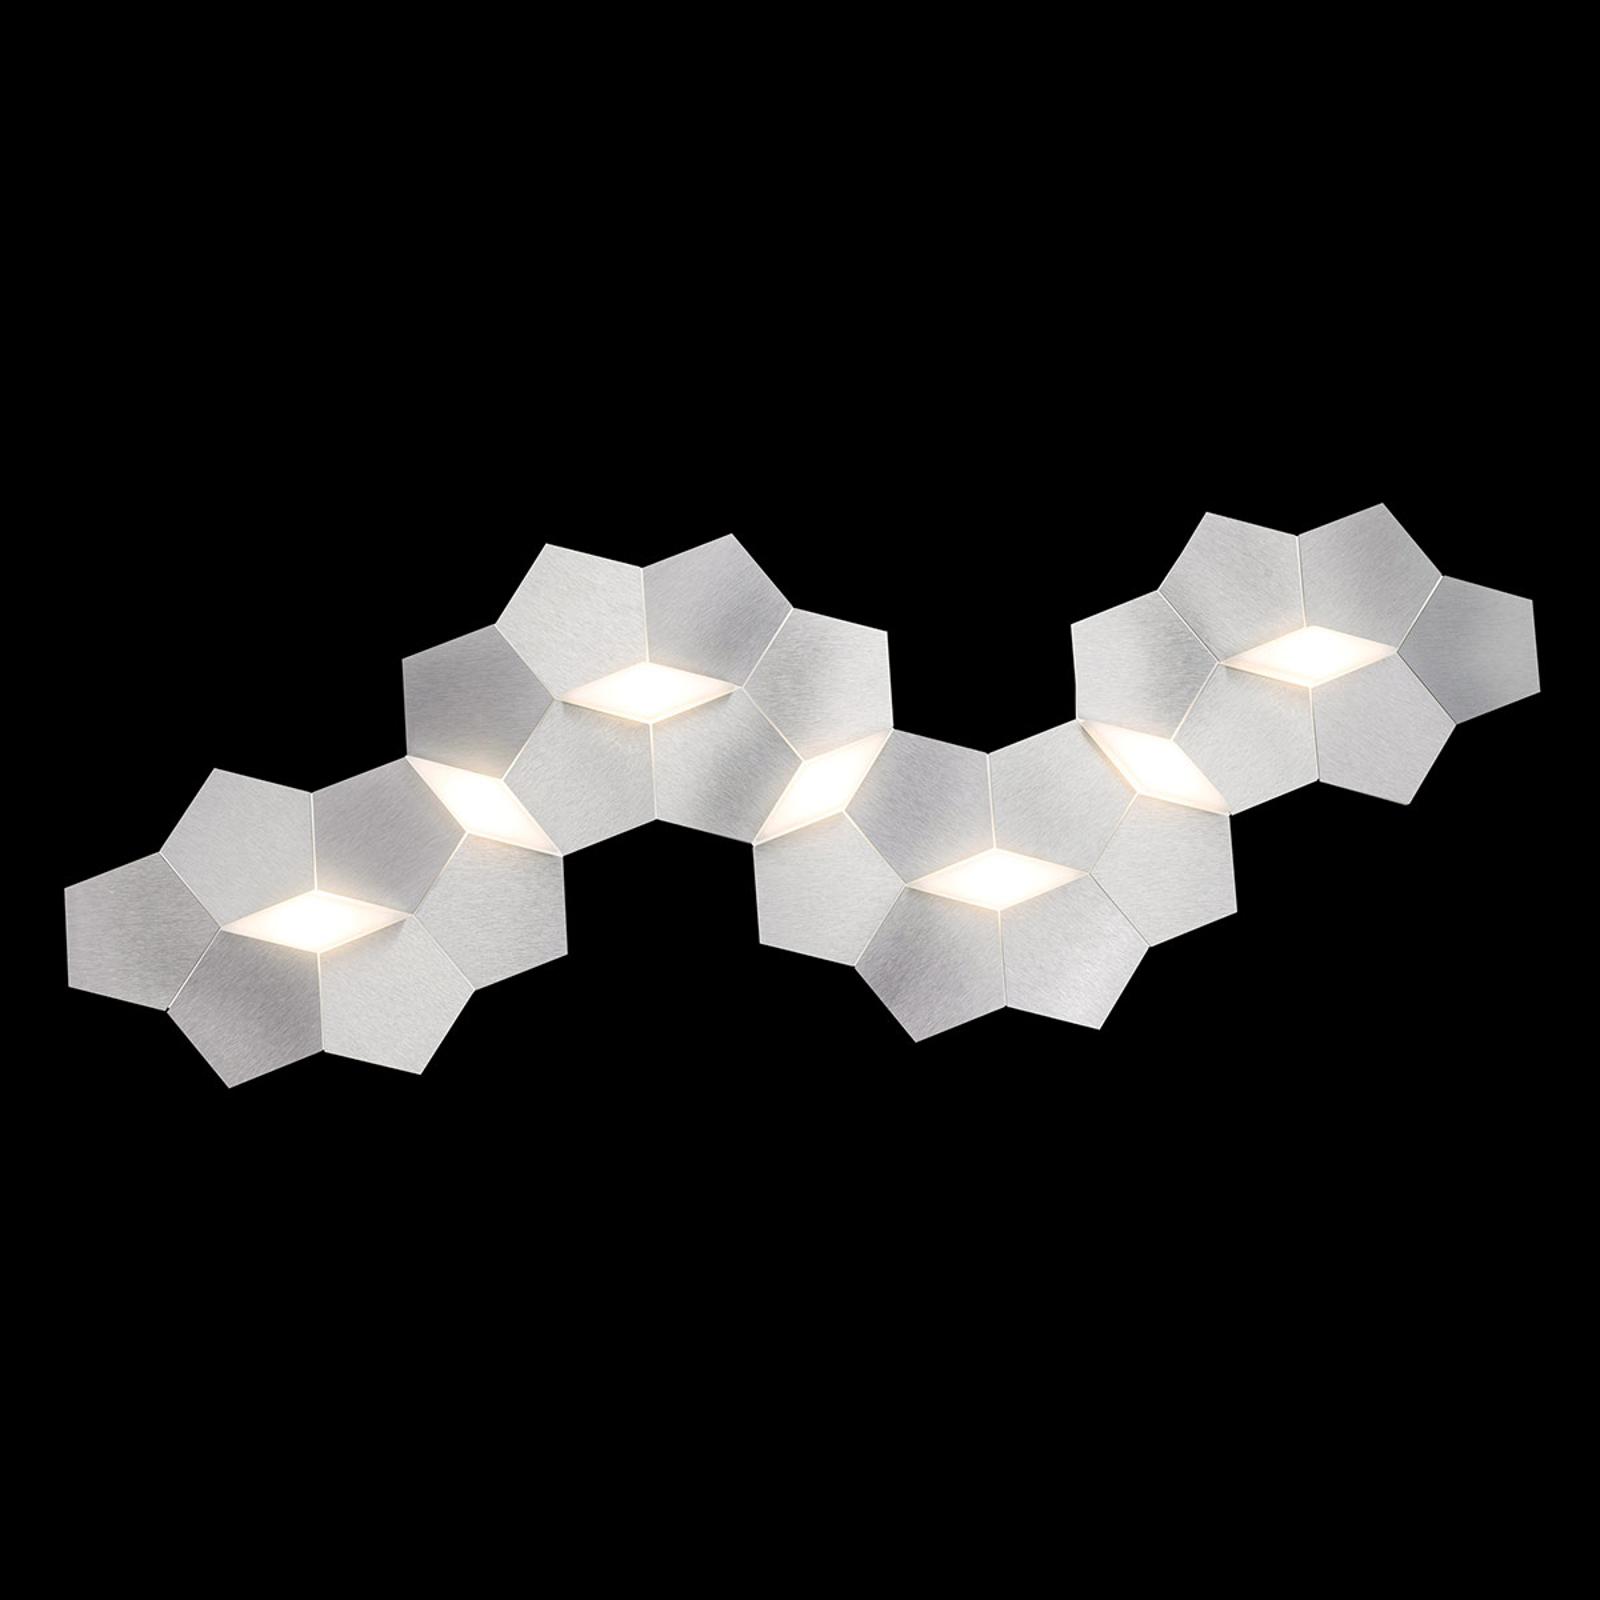 GROSSMANN Linde lampa sufitowa LED